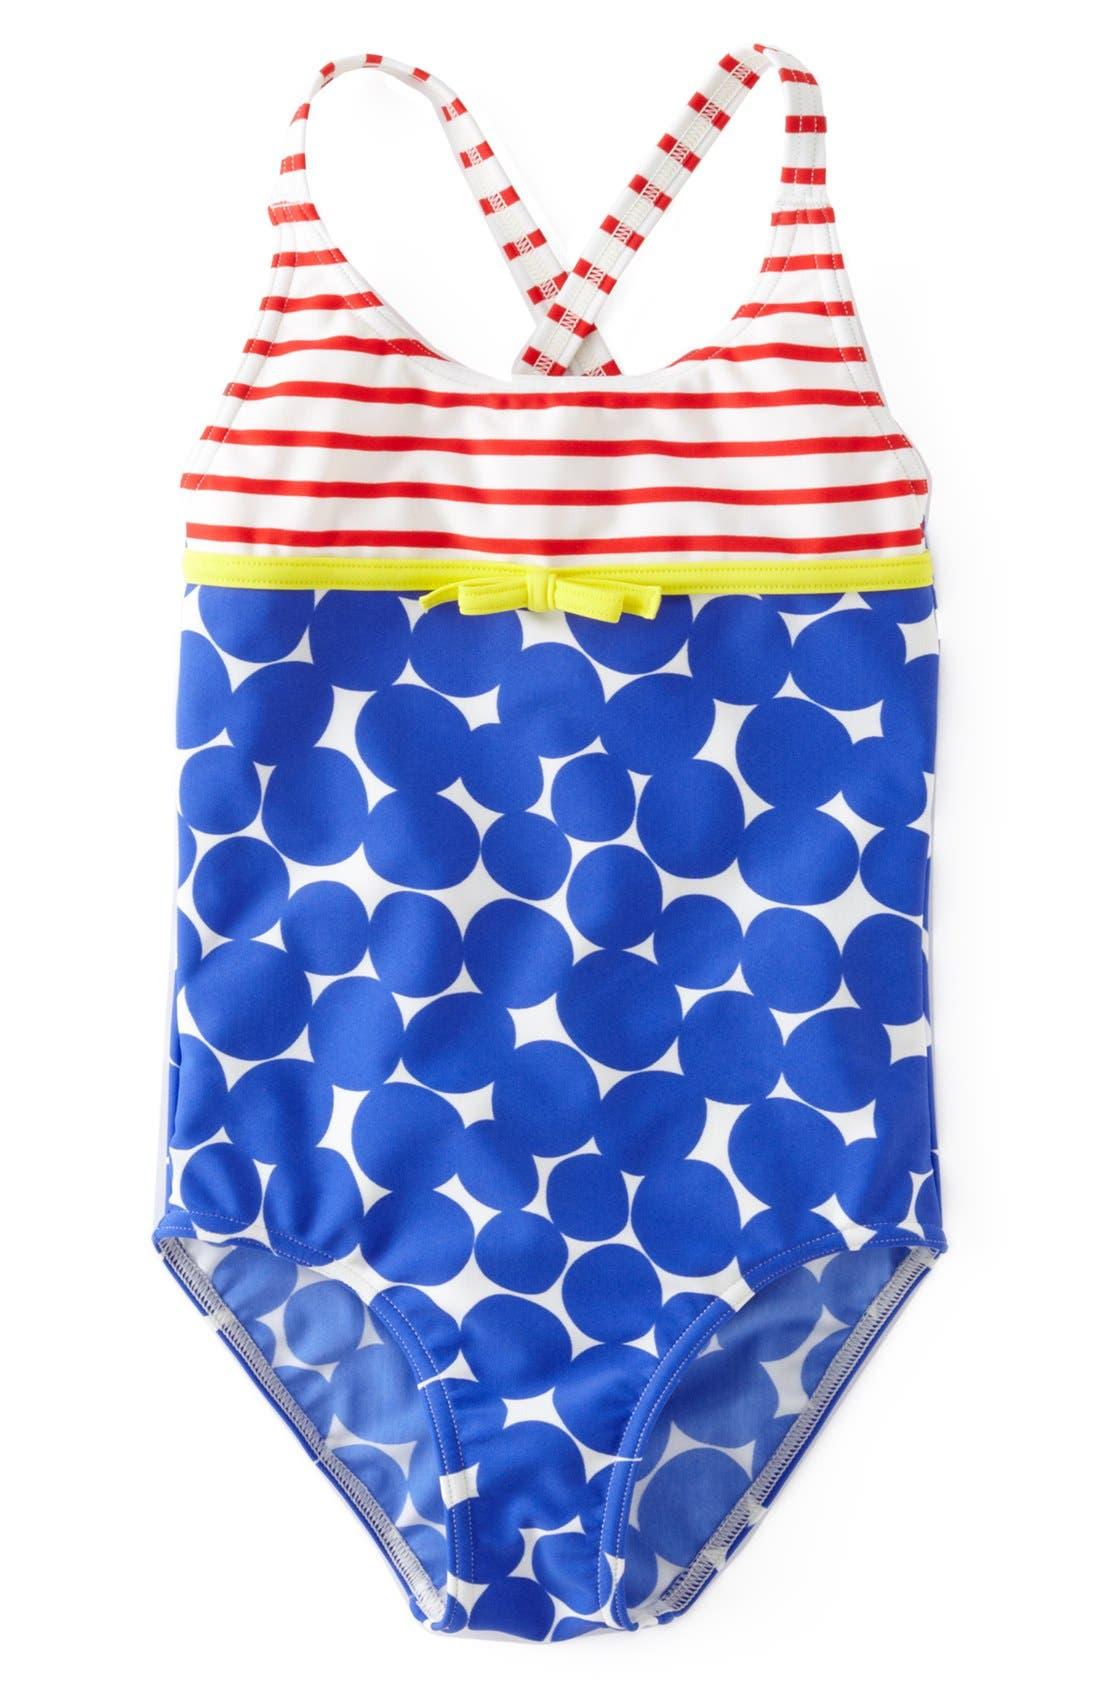 Alternate Image 1 Selected - Mini Boden 'Hopscotch' One-Piece Swimsuit (Little Girls & Big Girls)